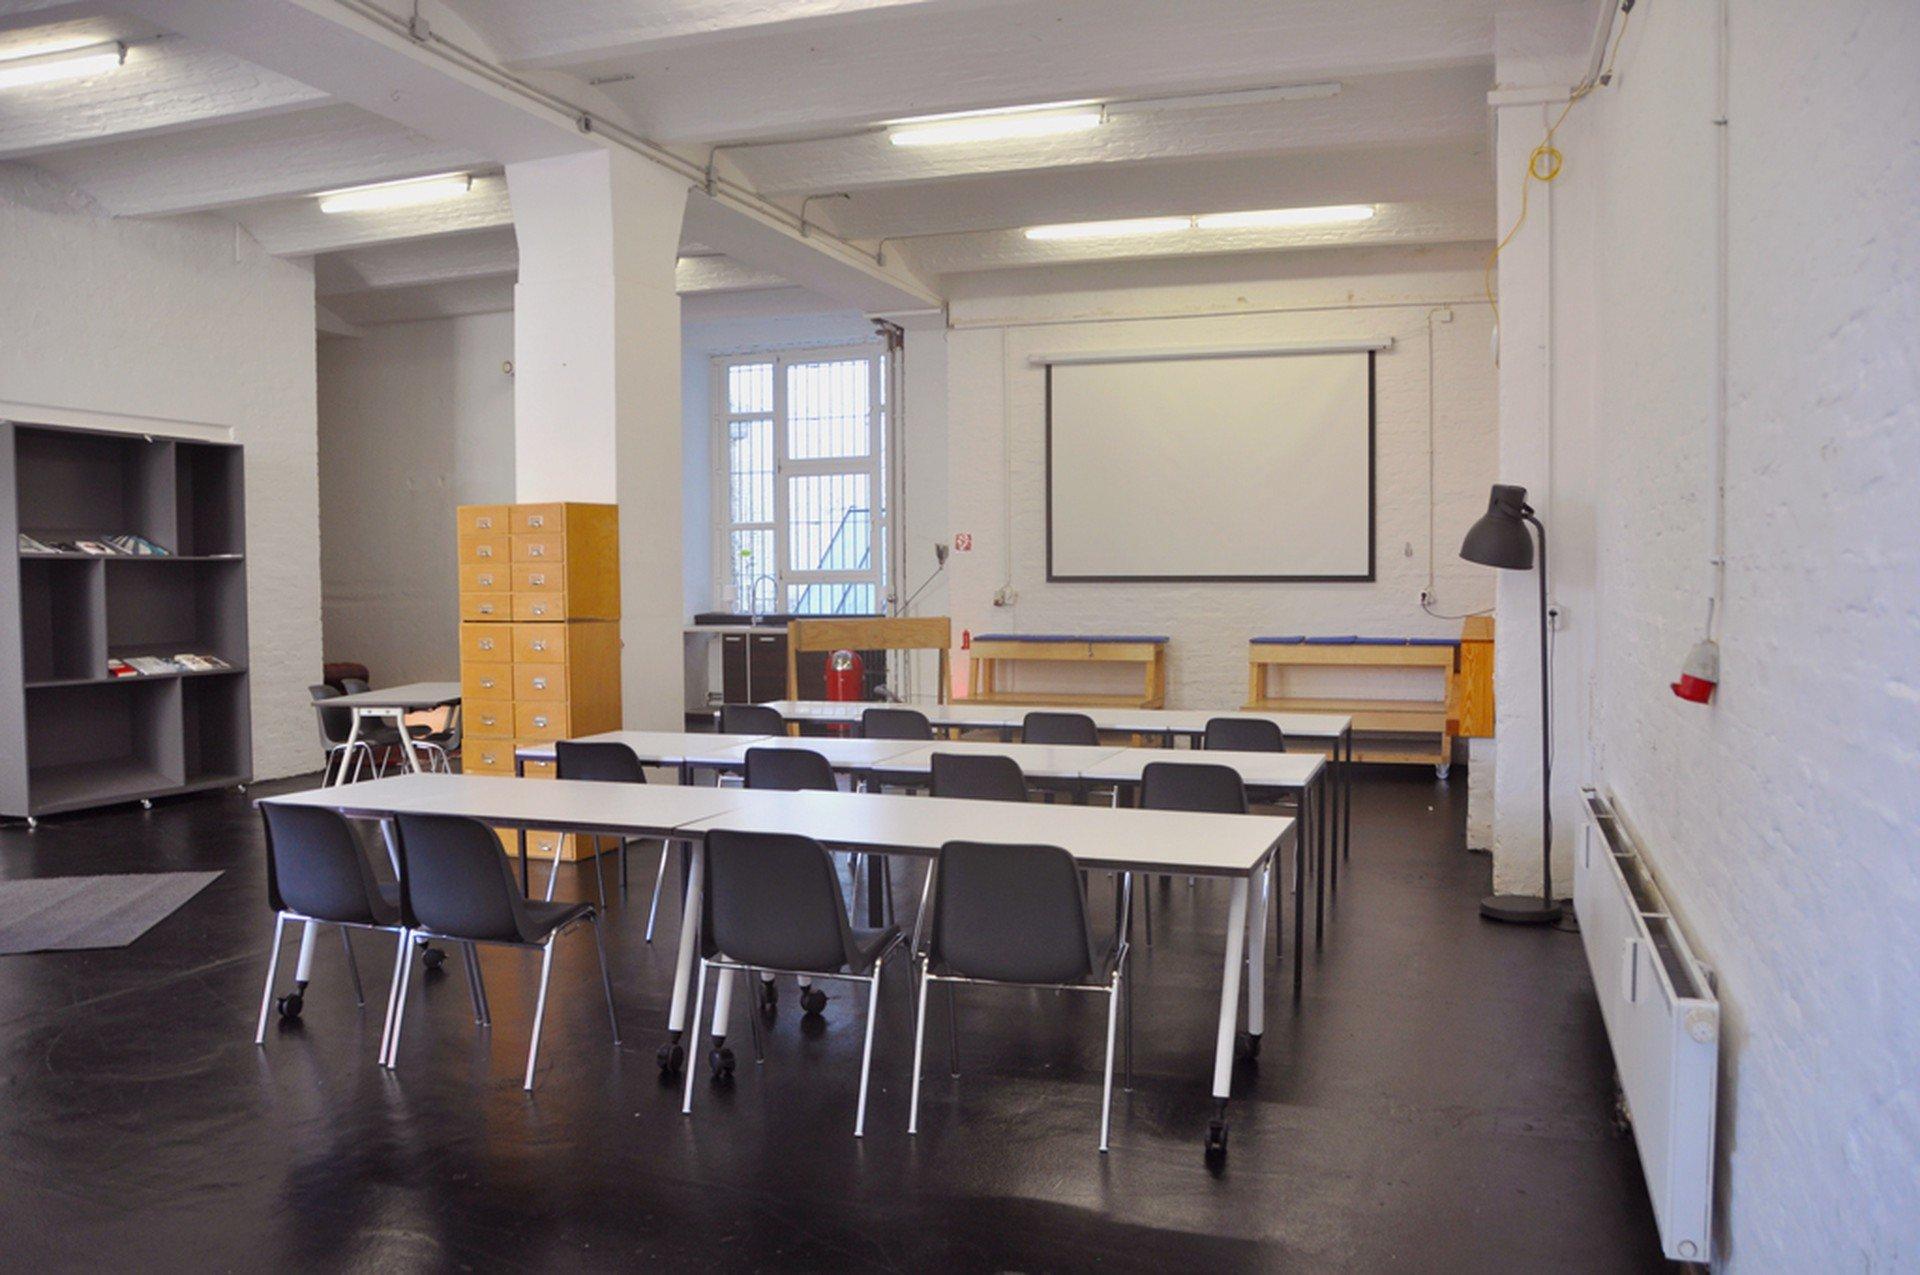 Berlin seminar rooms Meeting room betahaus - Loft image 6